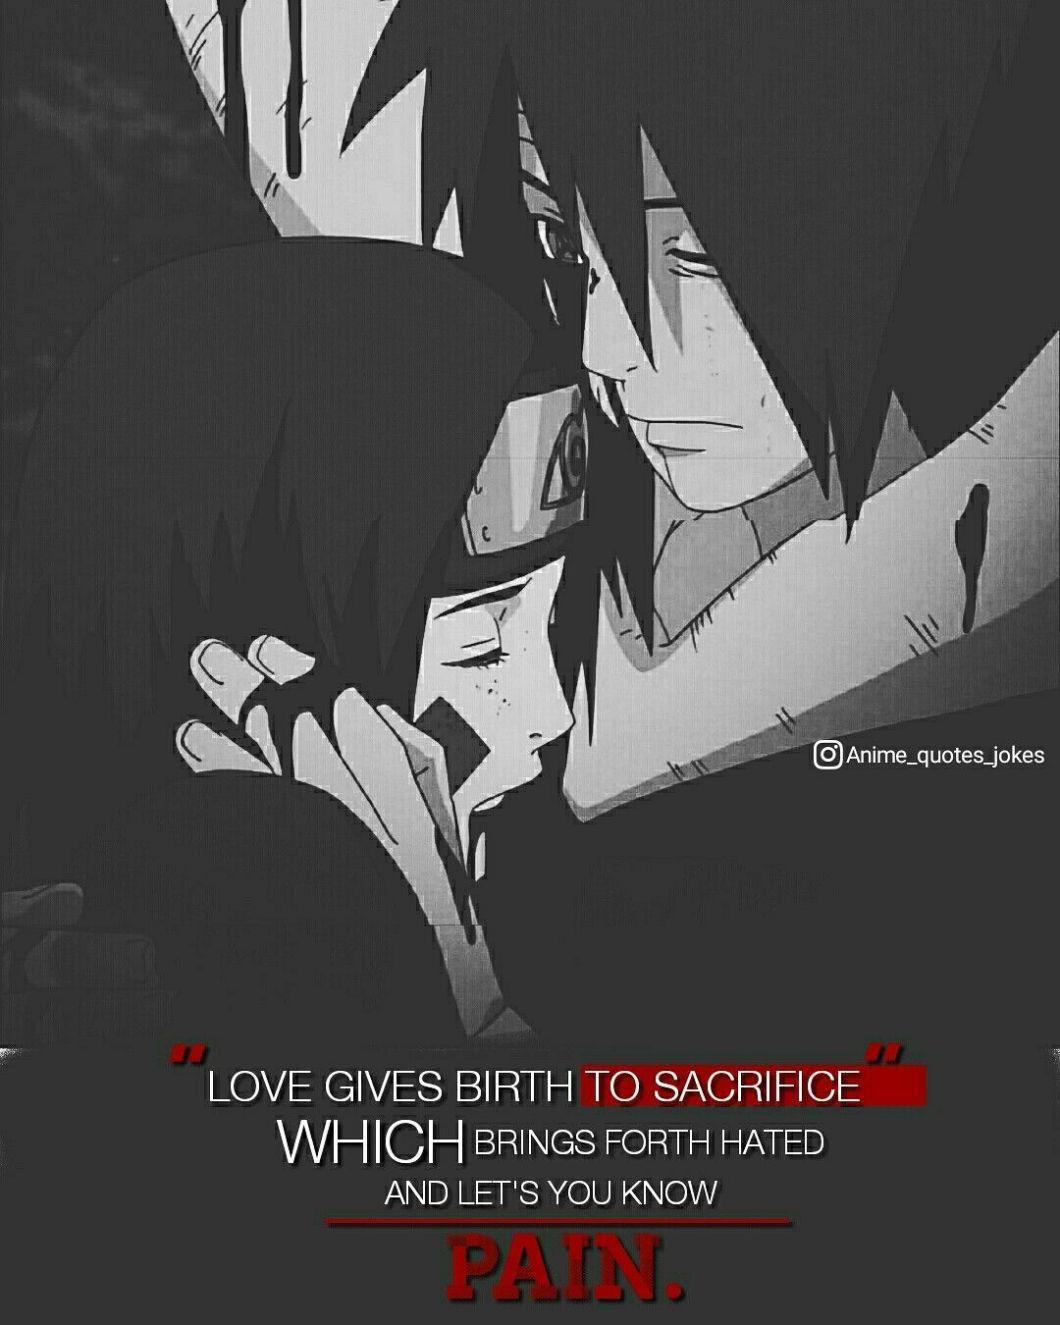 89 Deep Naruto Quotes Wallpaper In 2020 Naruto Quotes Naruto Shippuden Anime Naruto Comic